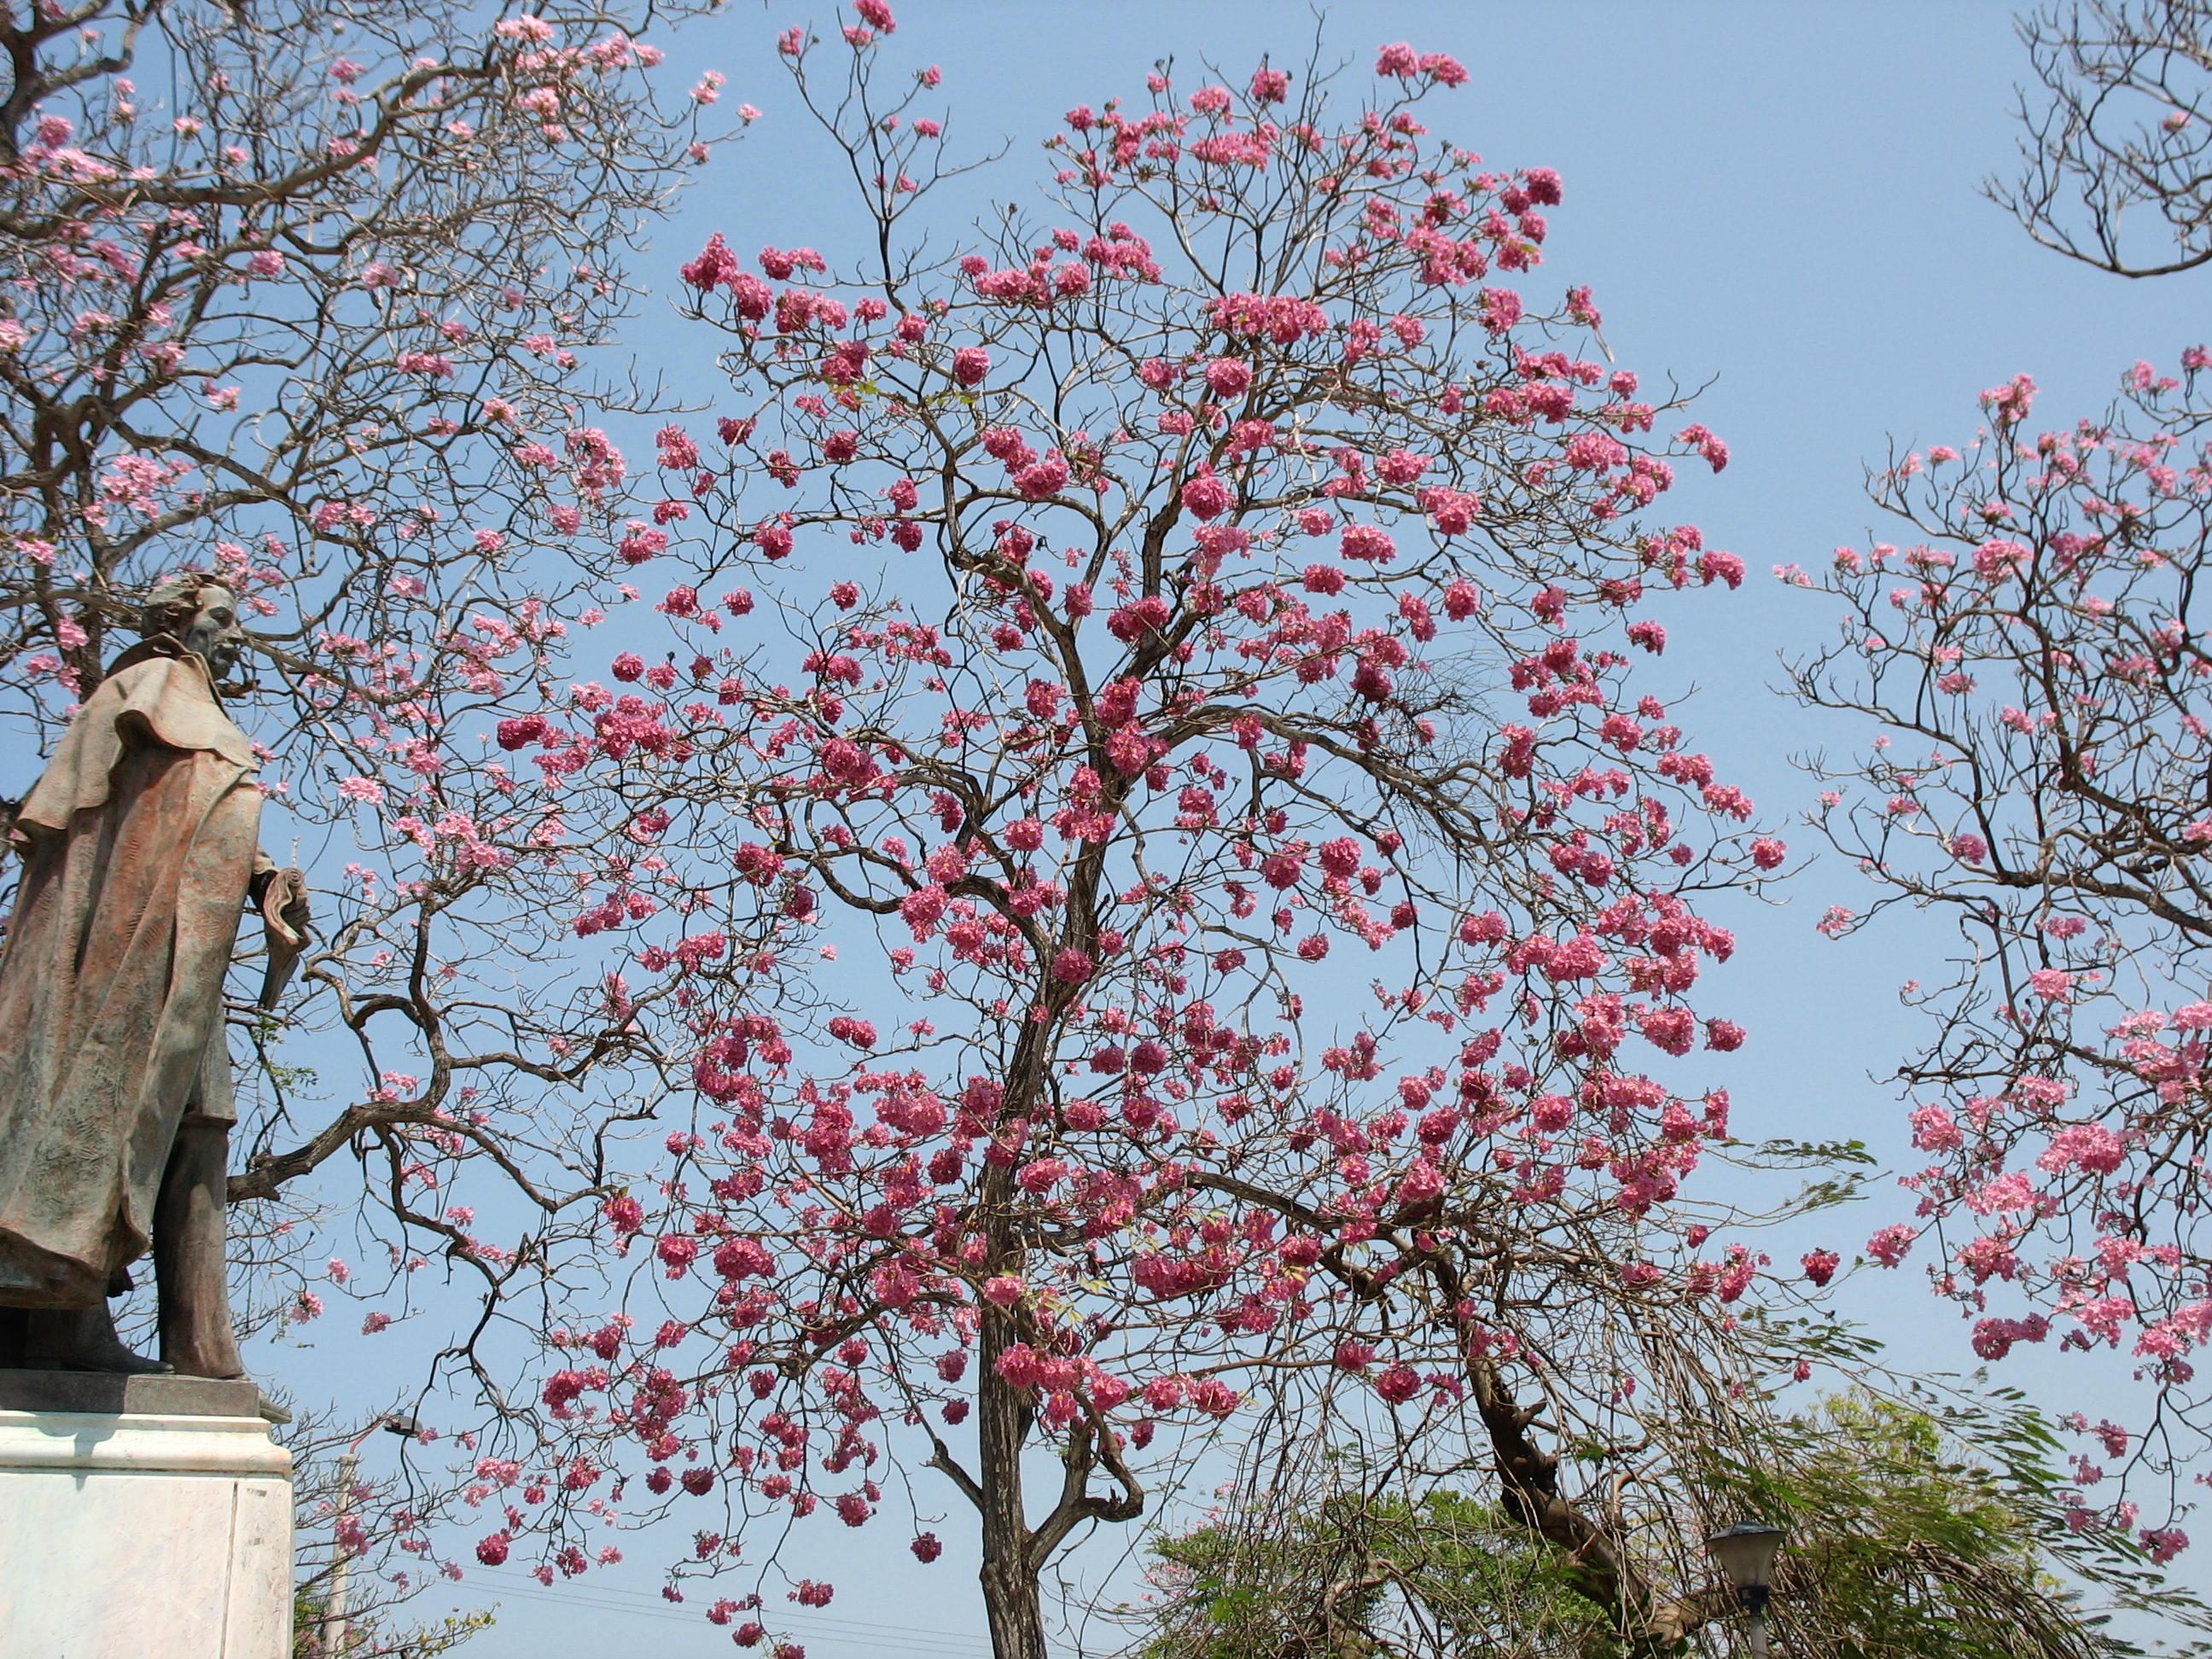 El cultivo del roble de sabana tabebuia rosea biota panama for Especies ornamentales